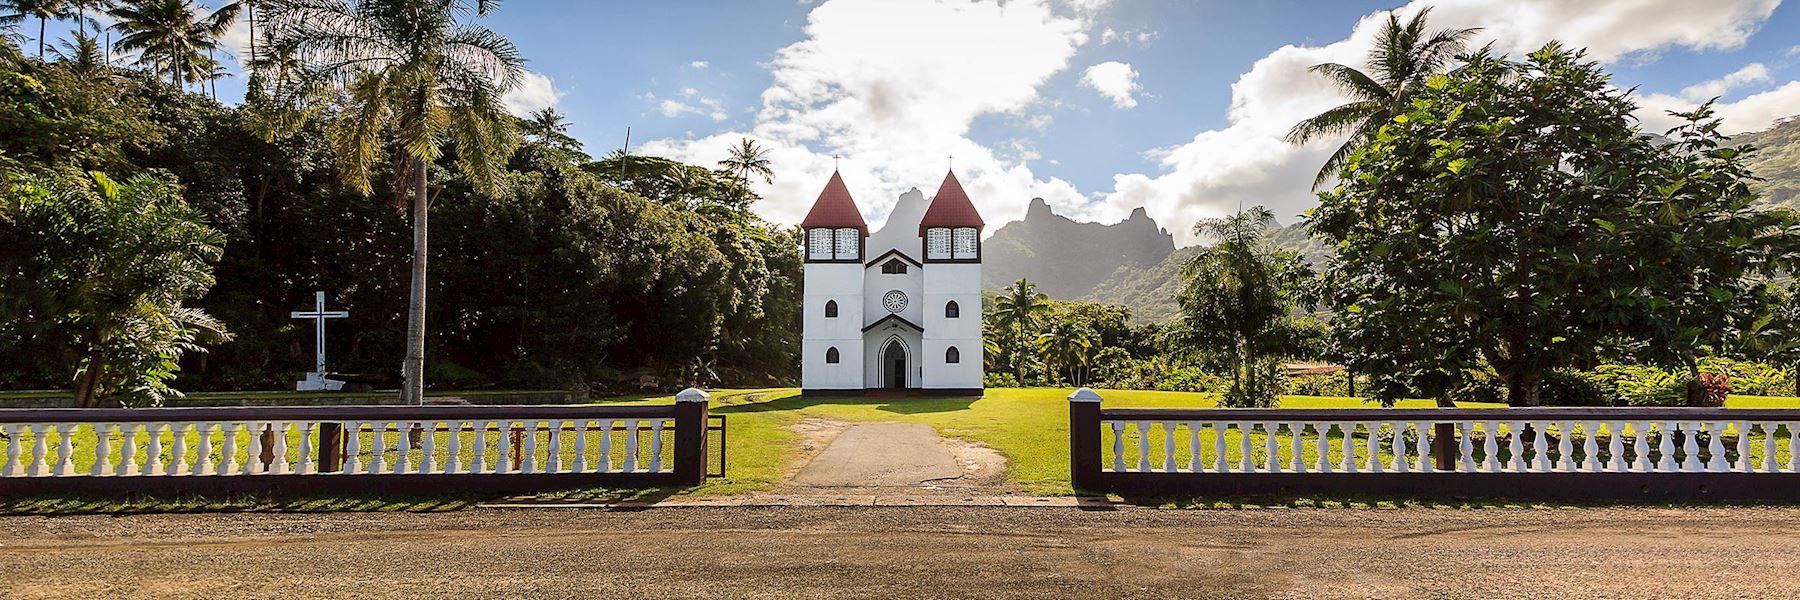 French Polynesia vacations & honeymoons